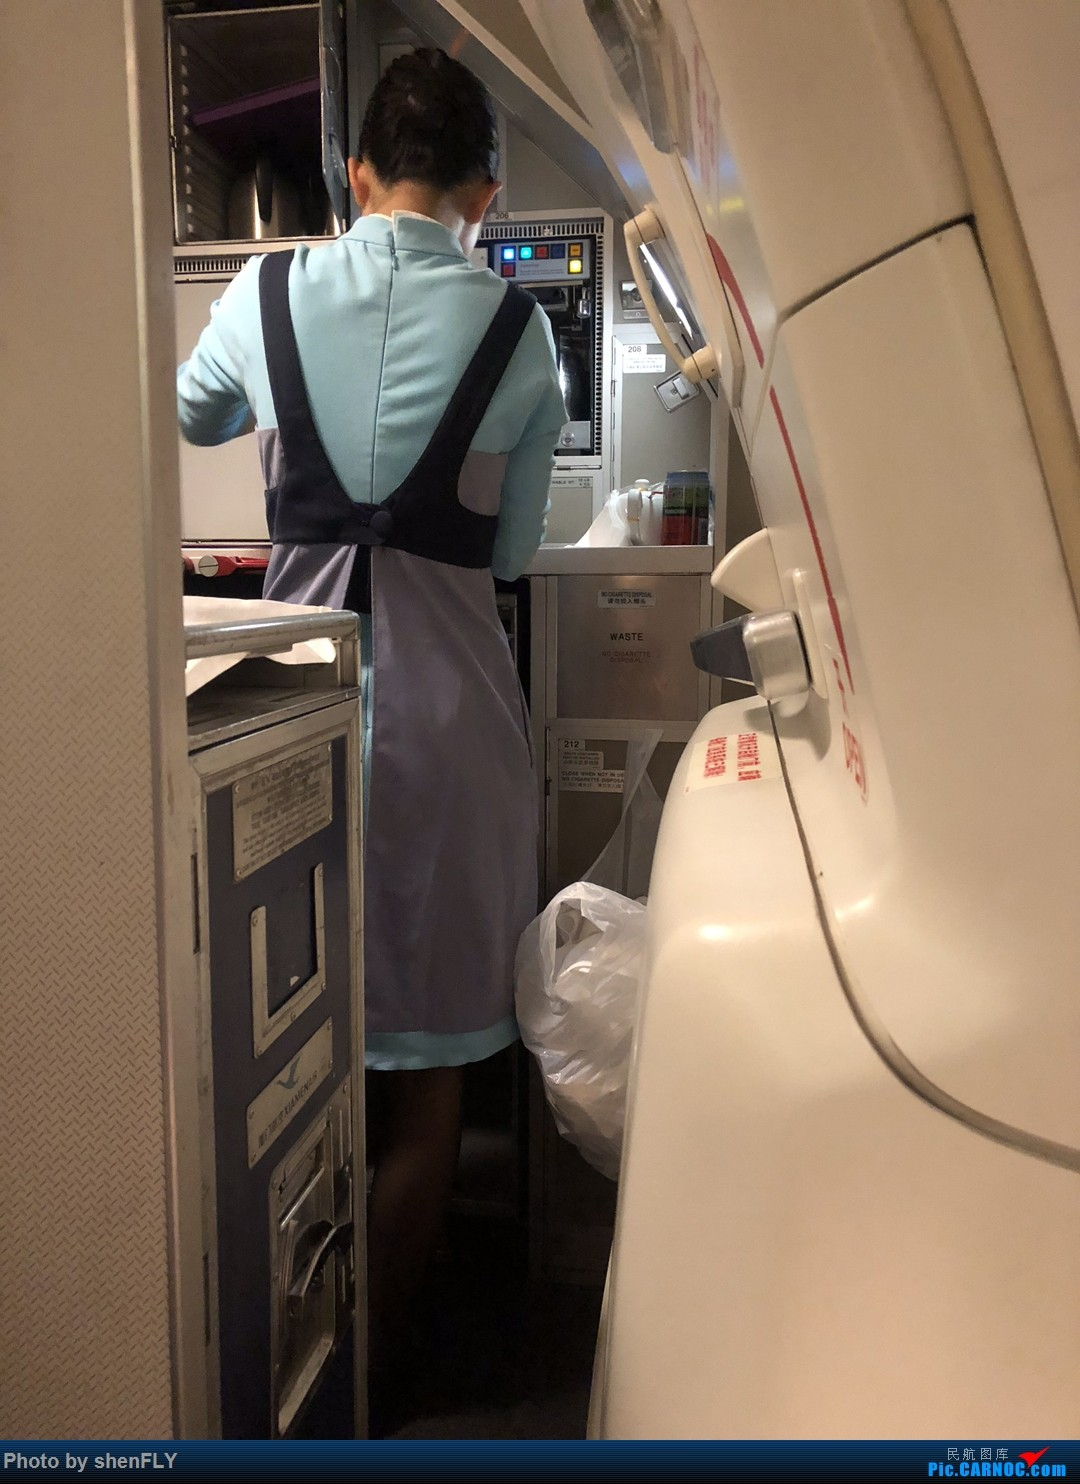 Re:[原创]伴随夕阳起飞,回忆最后一次搭乘厦航757飞行 BOEING 757-200 B-2866 空中